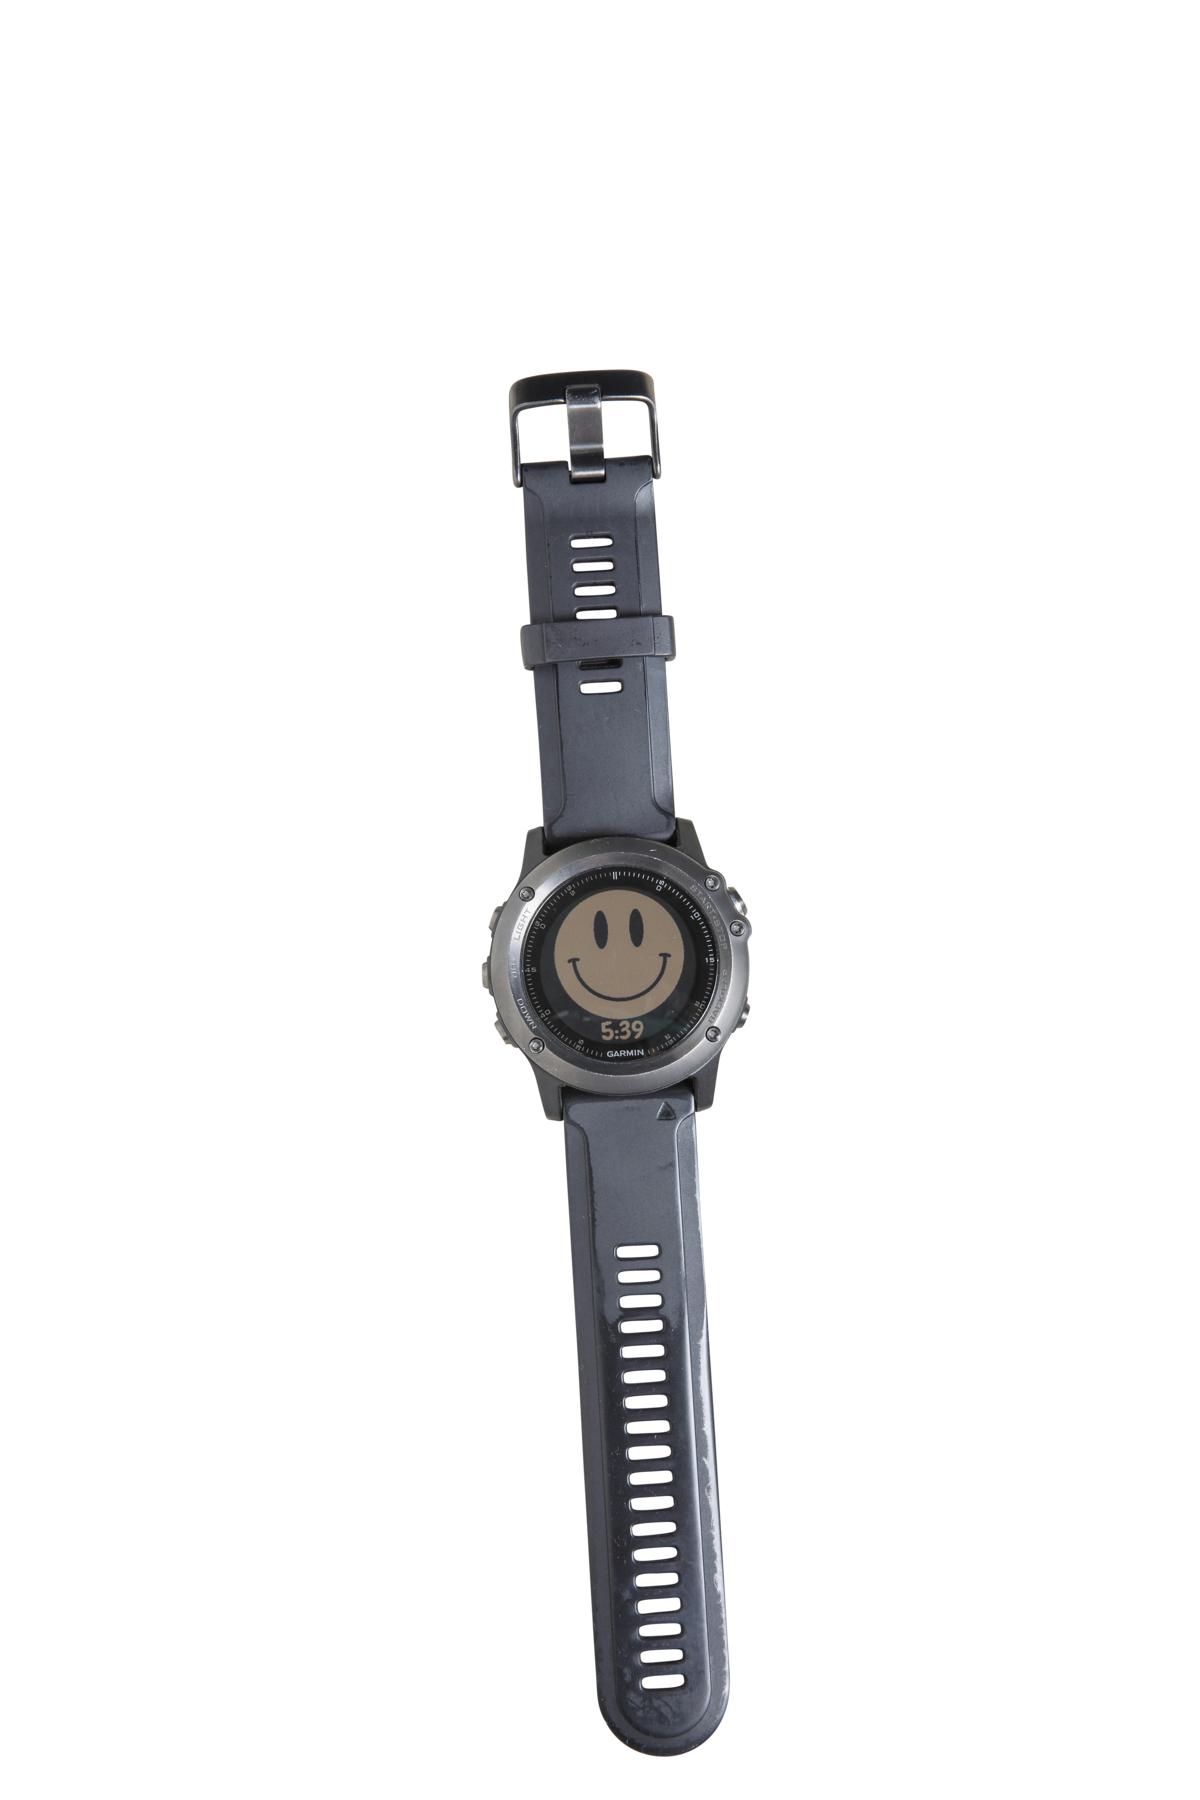 GARMIN三鐵錶。約NT$20,000